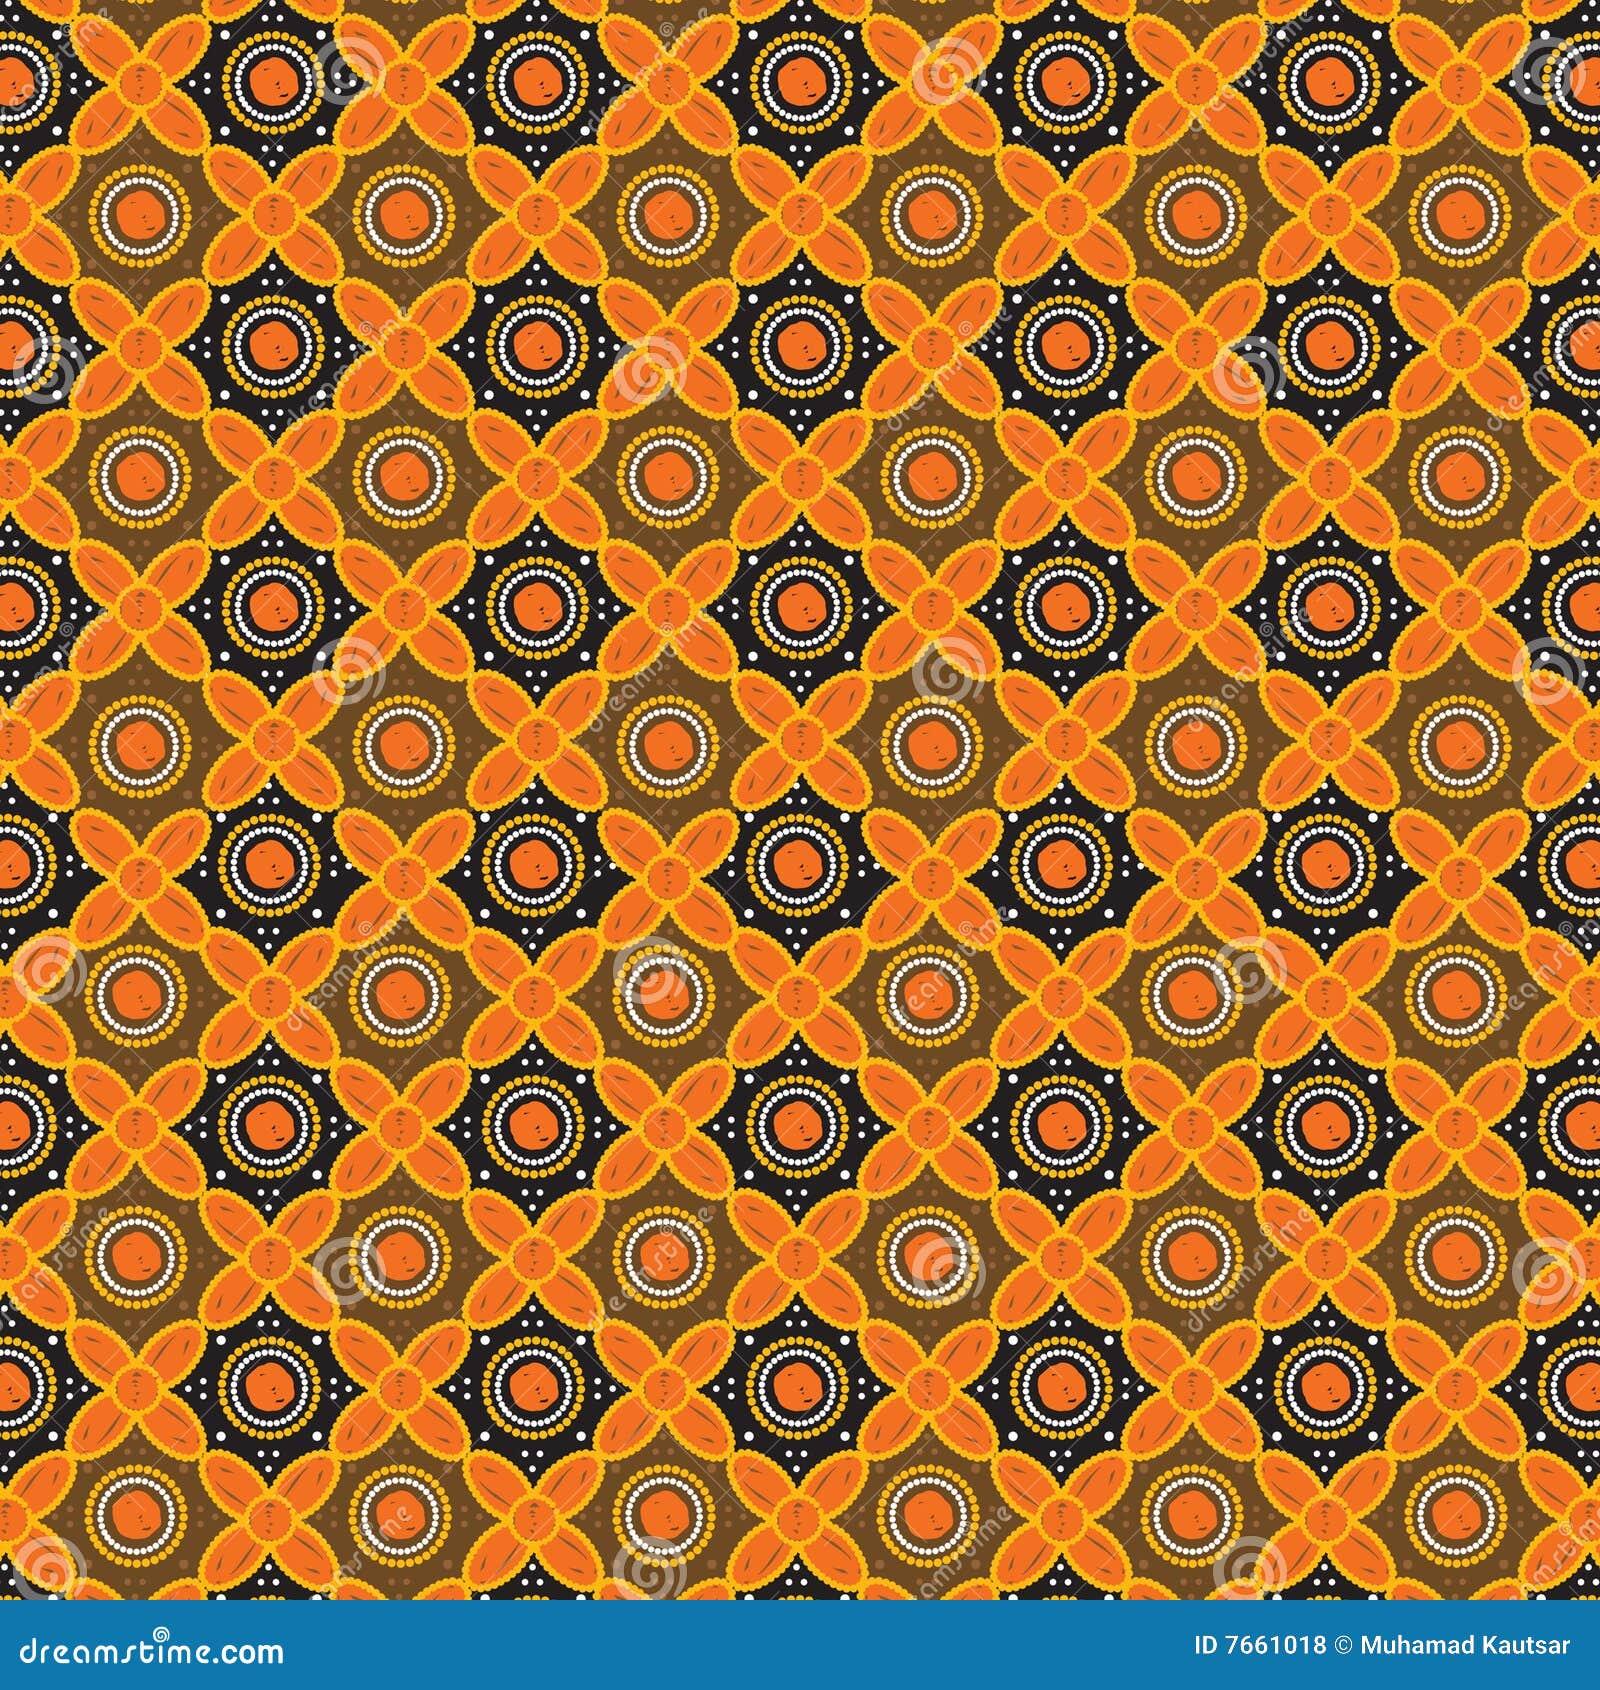 batik background vectors - photo #24